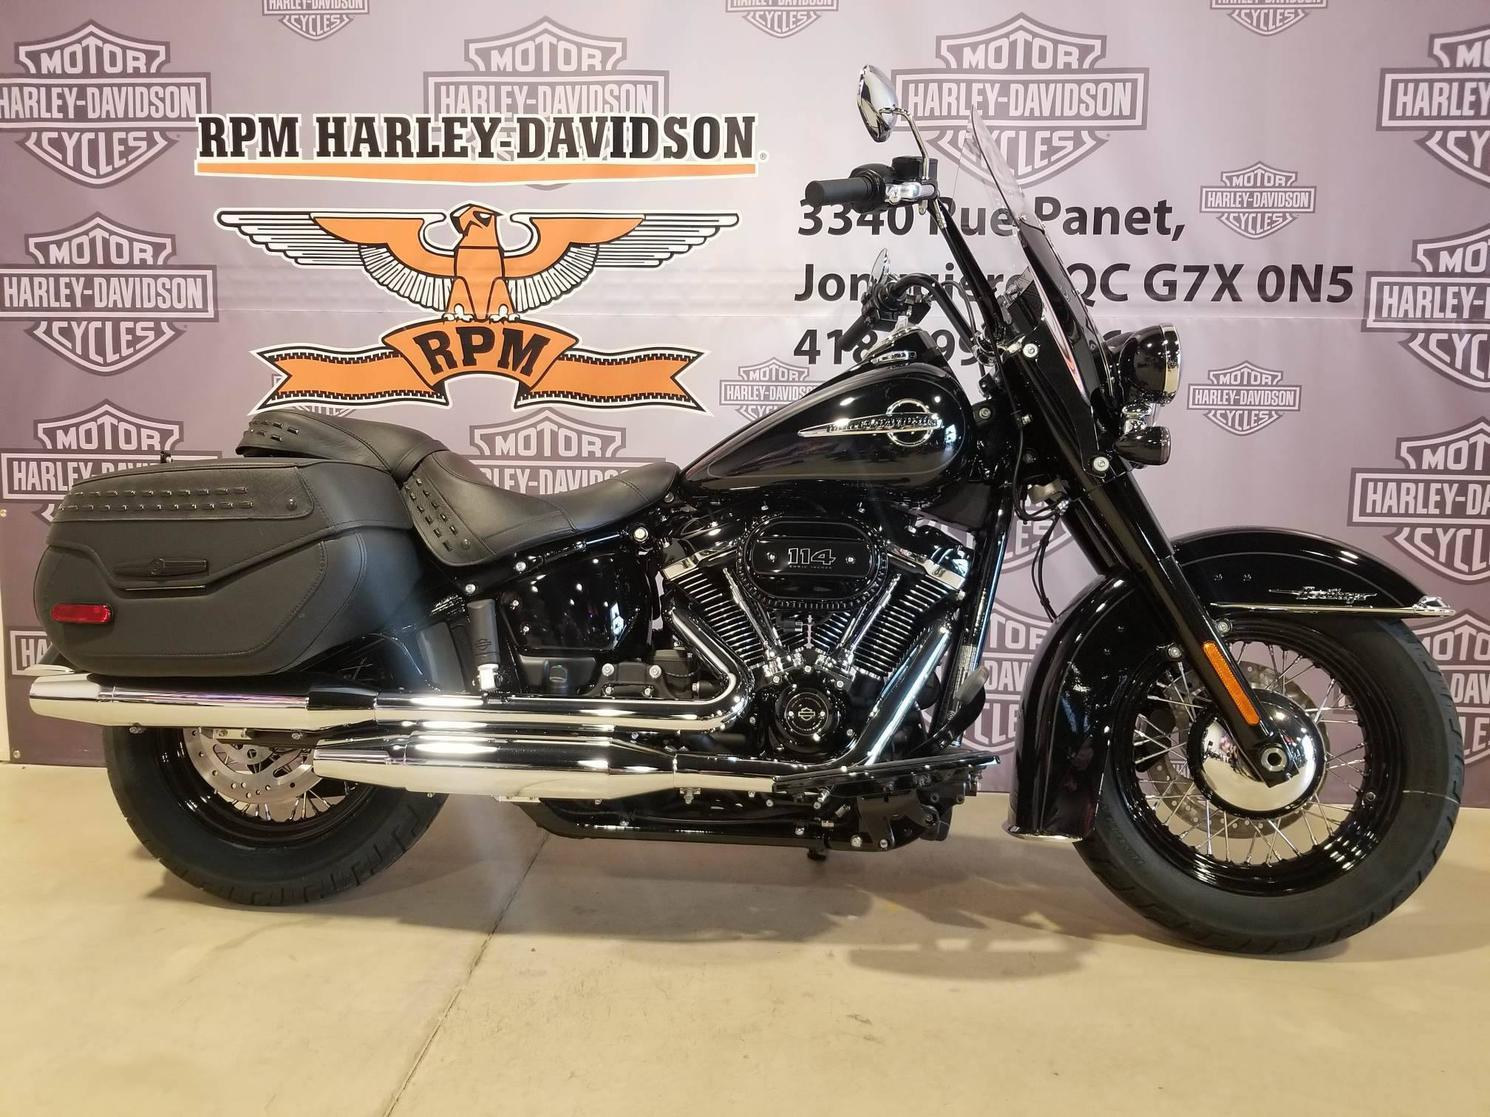 Harley-Davidson Softail Heritage 114 2020 - FLHCS